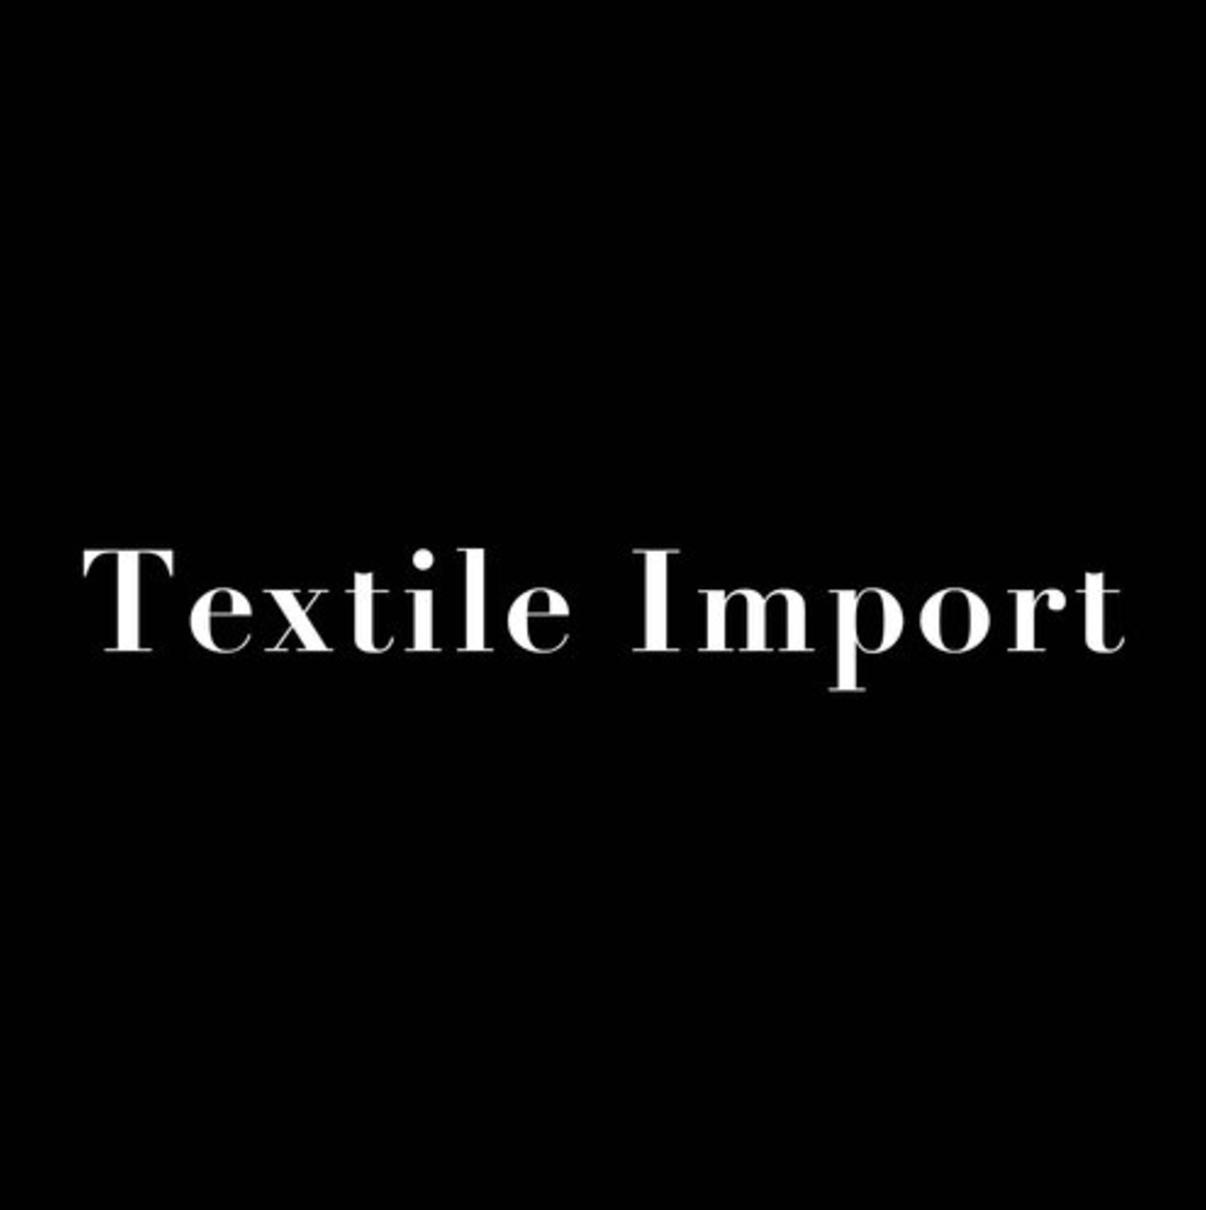 kelsy-zimba-collections-zform-textileimport.jpg